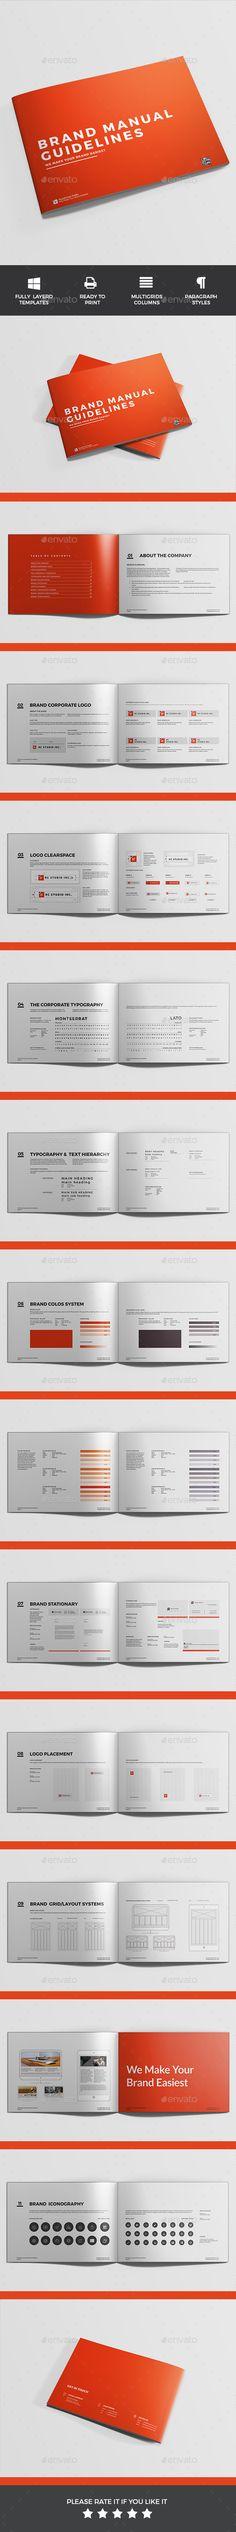 Brand Manual Template #design Buy Now: http://graphicriver.net/item/brand-manual/12868910?ref=ksioks